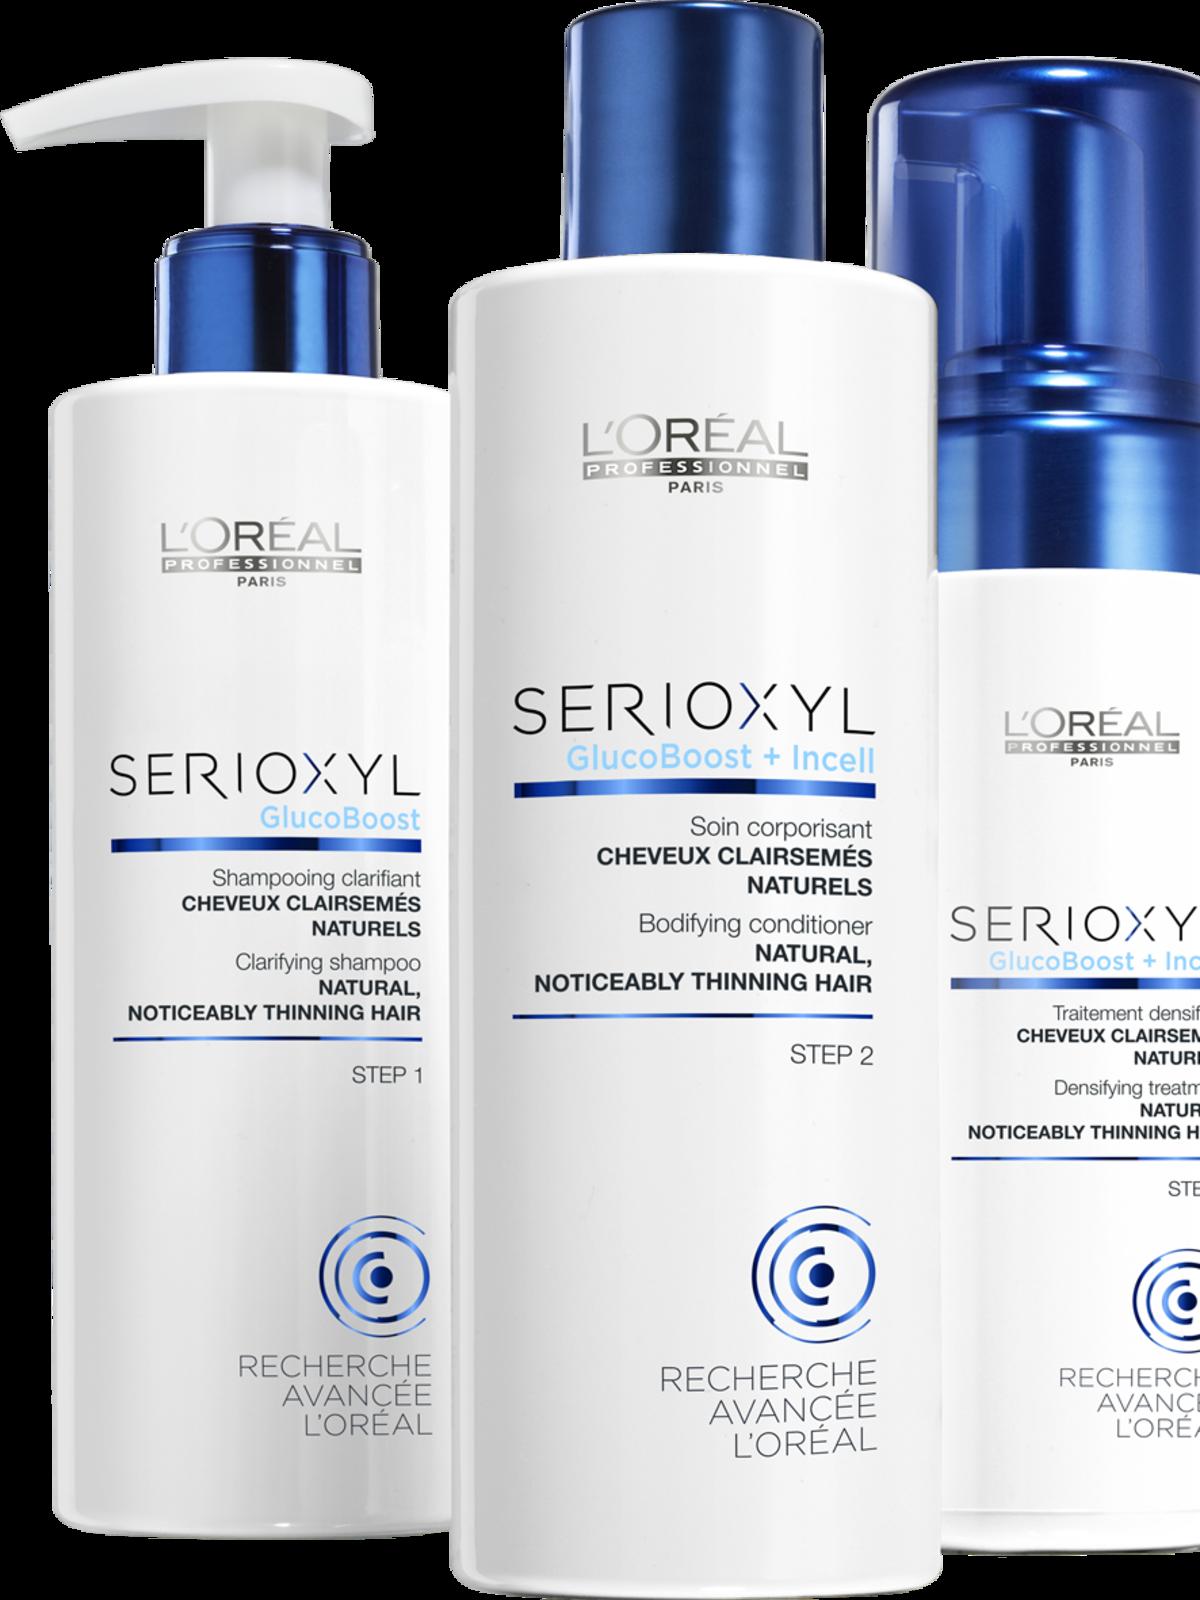 Zestaw L'Oréal Professionnel Serioxyl, 180zł